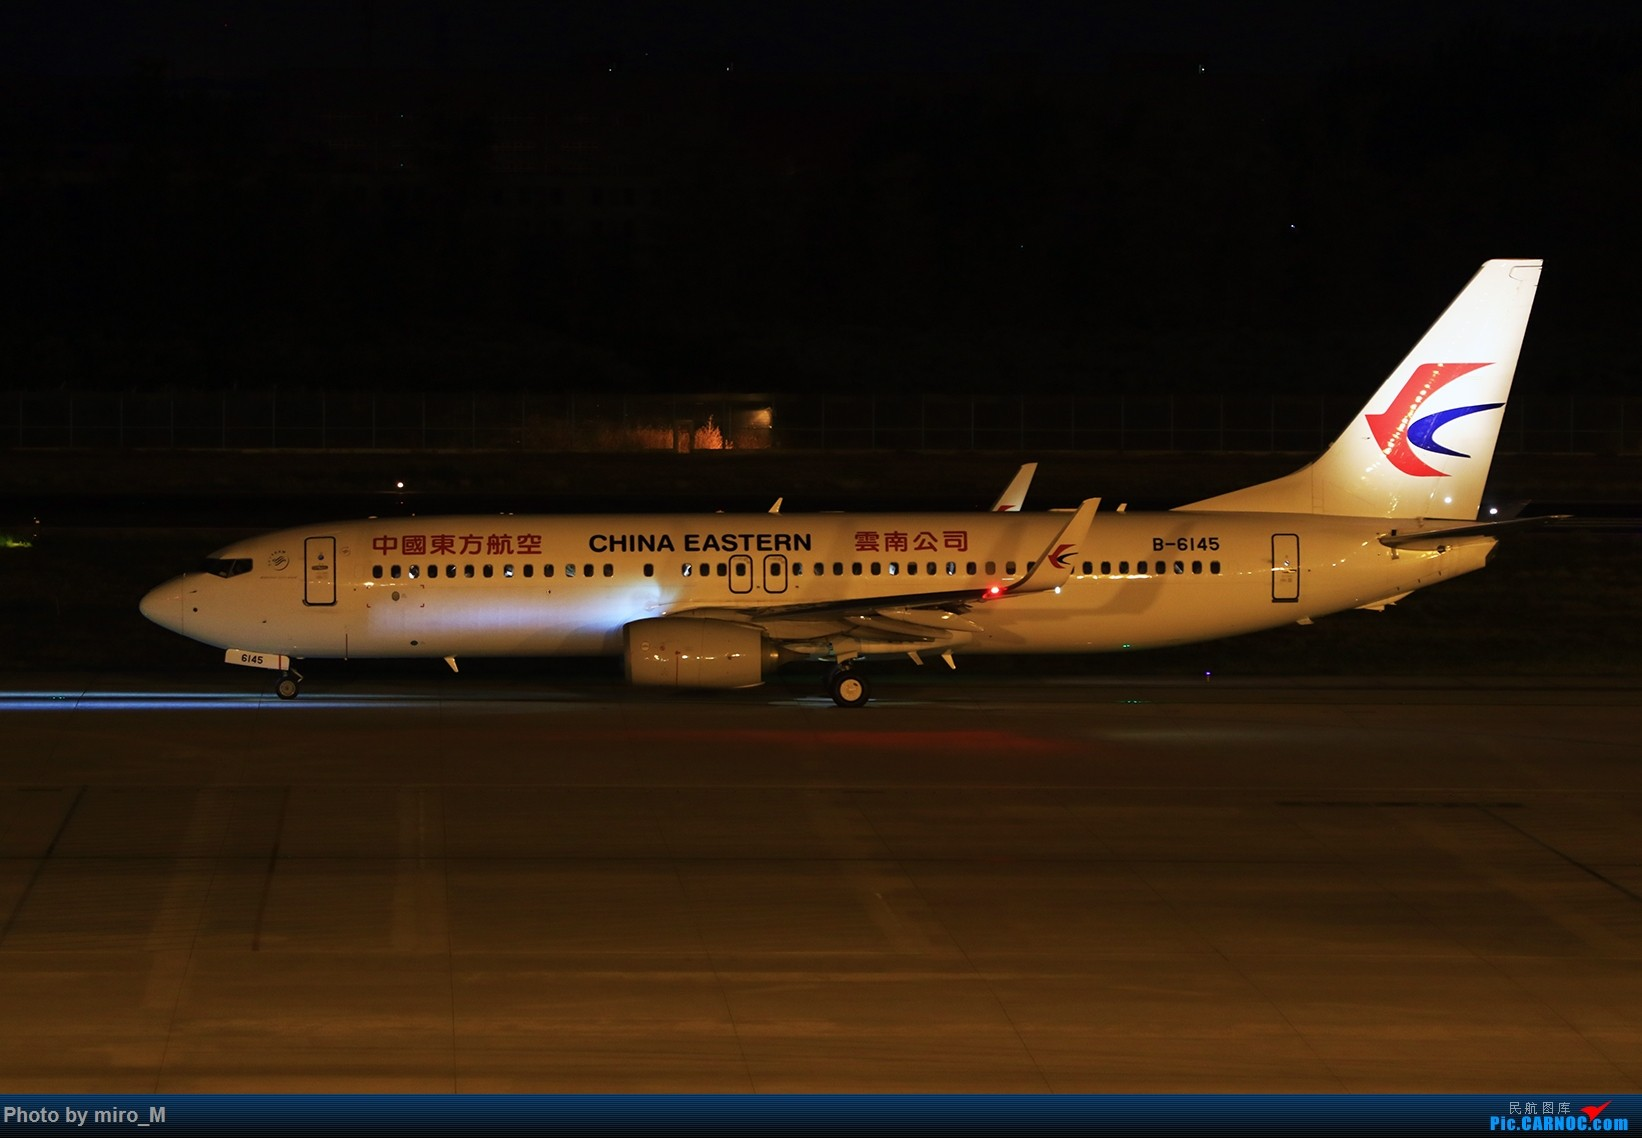 Re:[原创]欧洲浪了一圈,CS100,BAE146,fokker70等新老机型串着飞+ZRH,MUC,FRA,AMS,TLS拍机 BOEING 737-800 B-6145 中国北京首都国际机场